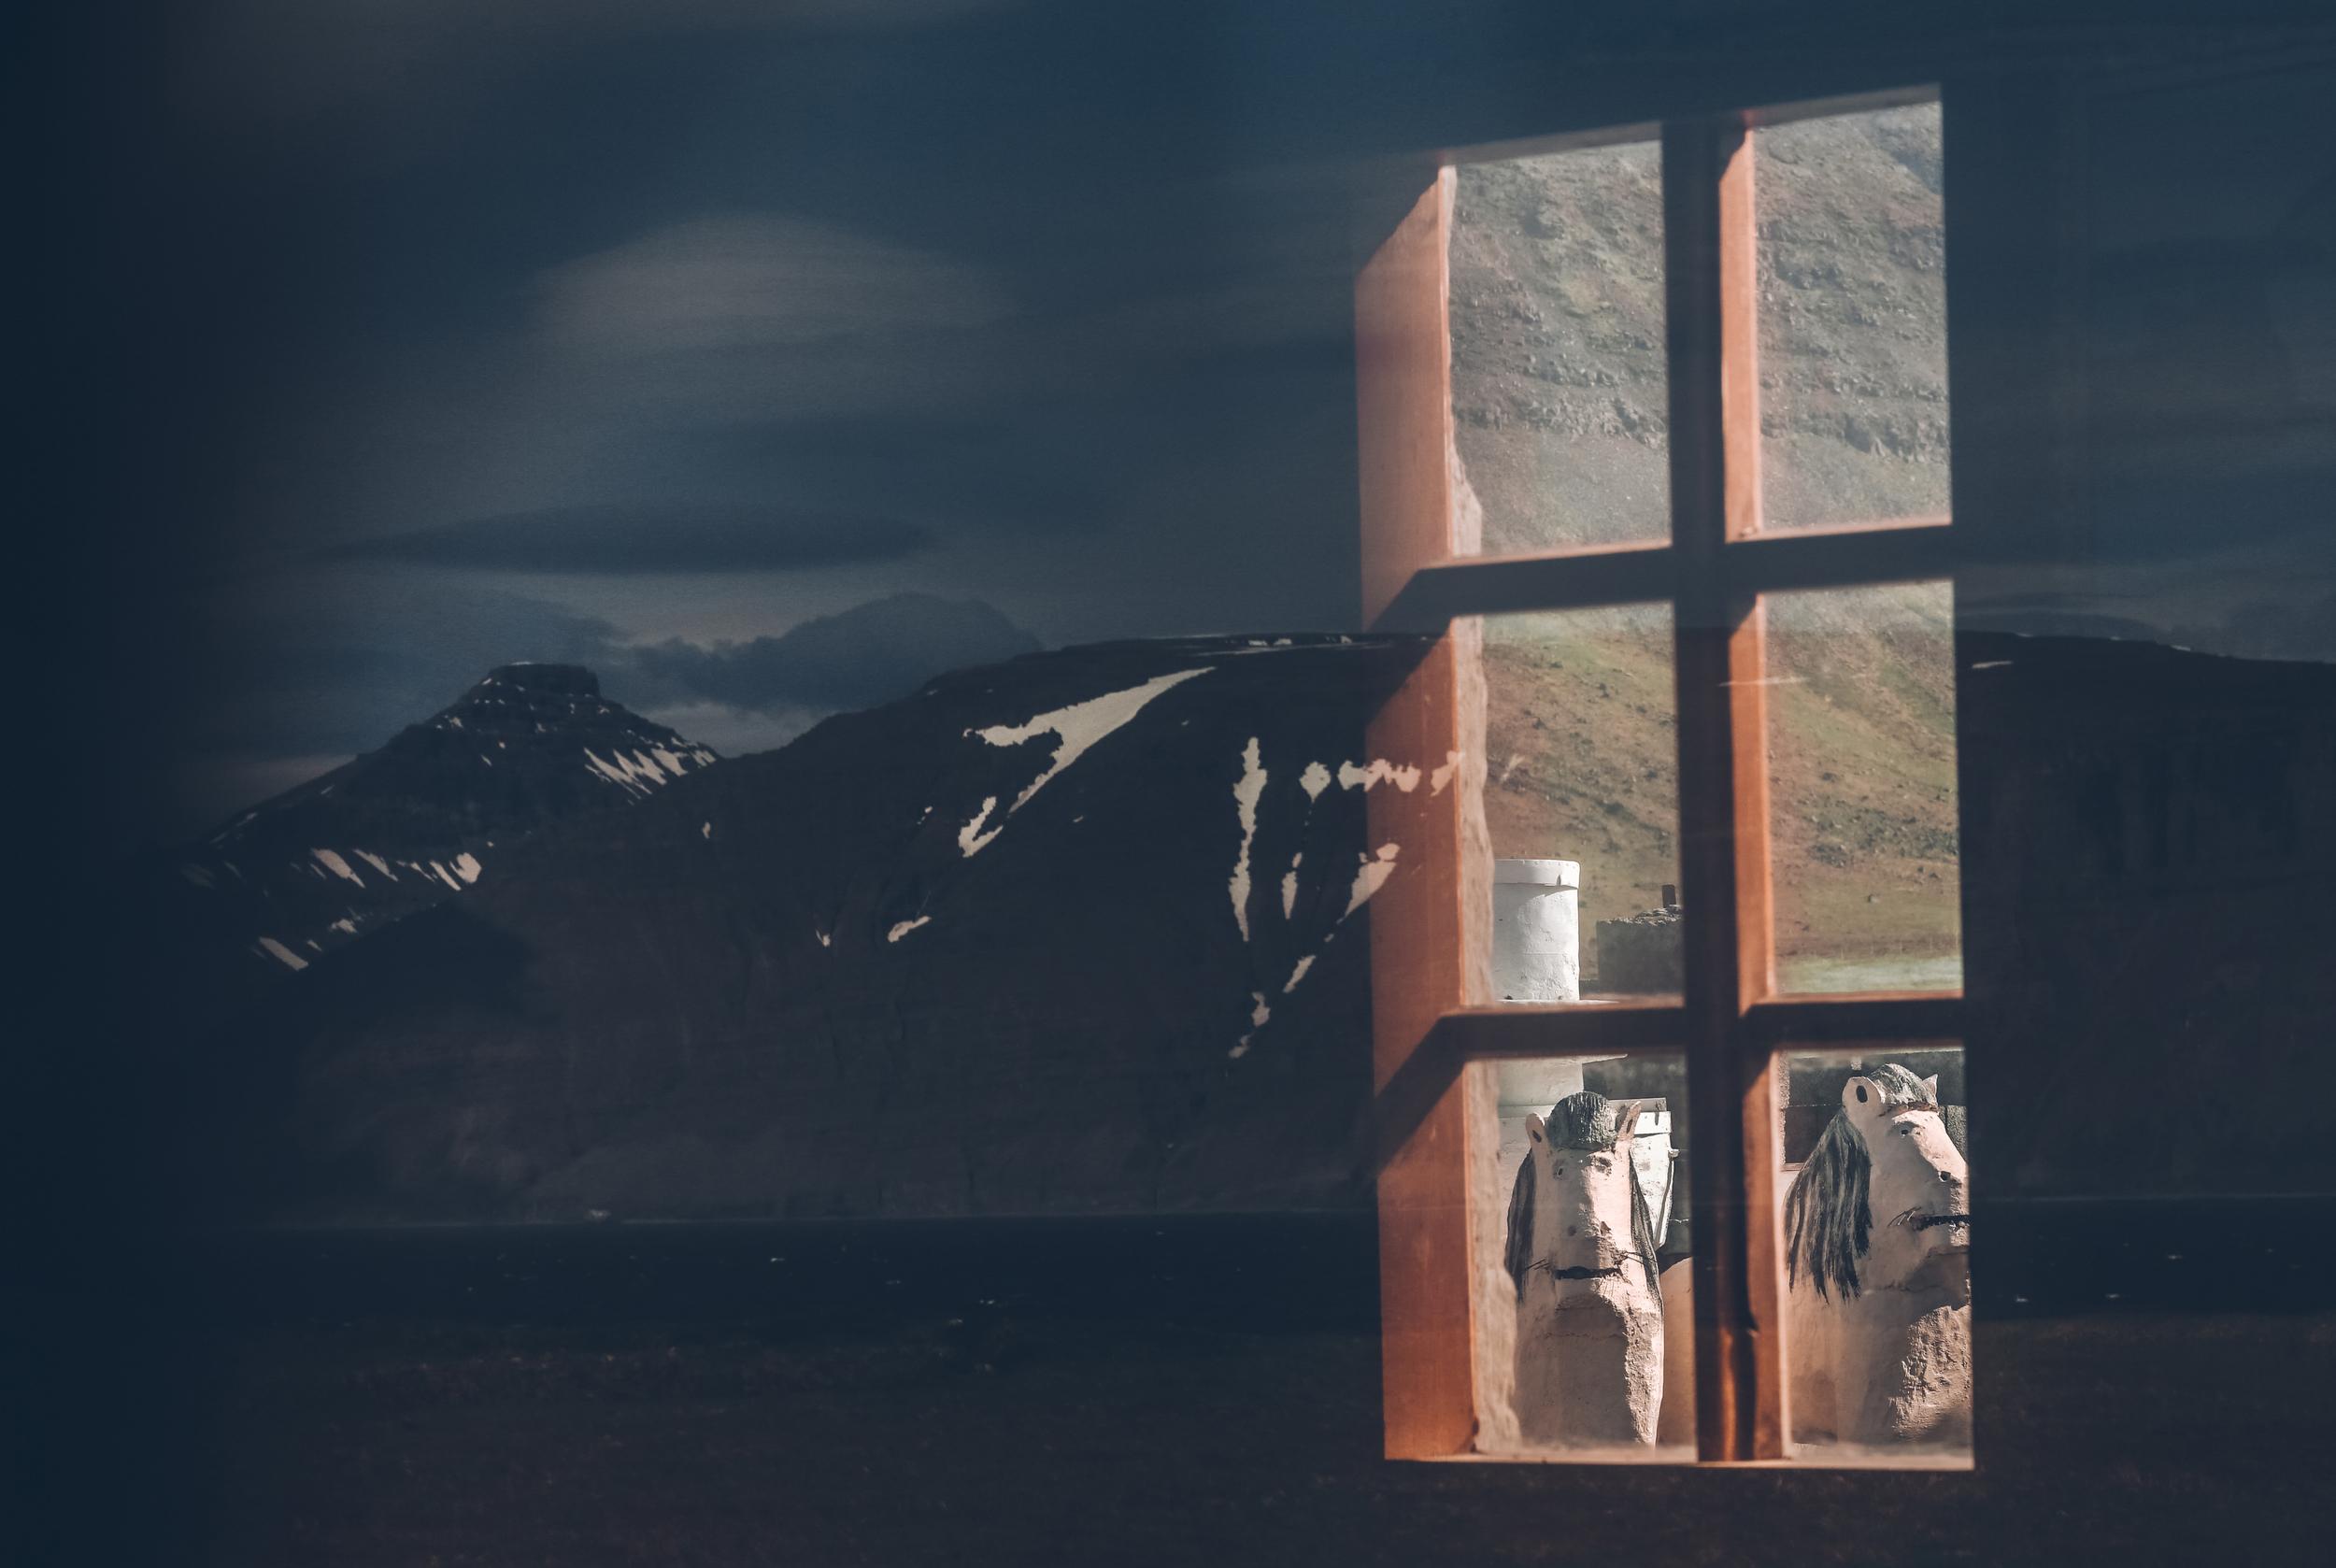 a reflection of Samúel Jónsson´s lions at Selárdalur.jpg